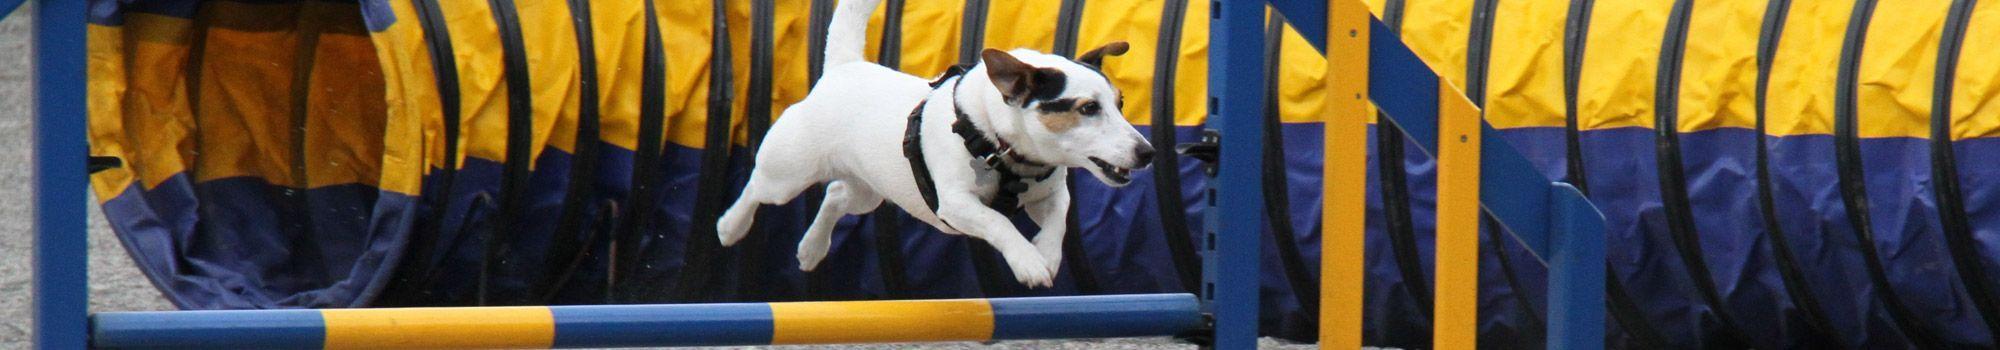 residencia para perros canina